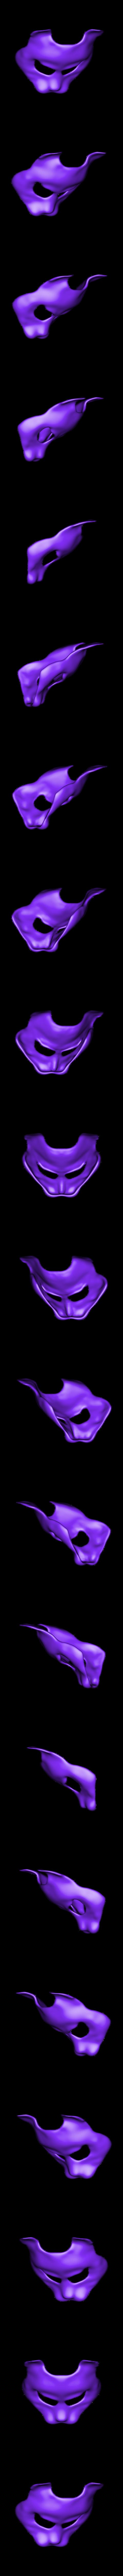 streetcatmask_delukart.stl Download free STL file Street Cat Mask • 3D printer template, delukart